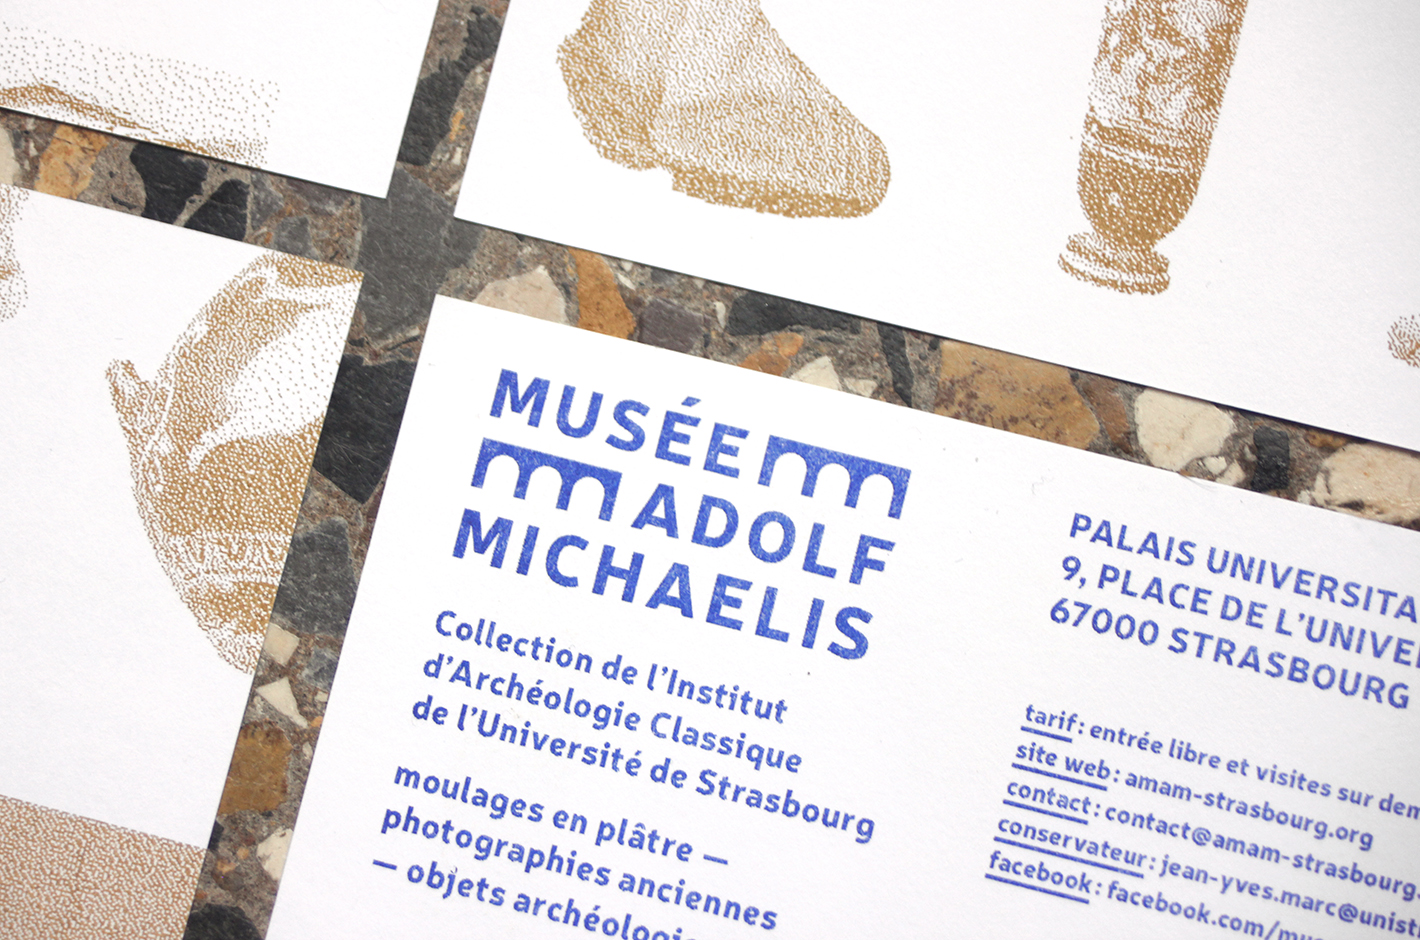 Musée Adolf Michaelis — flyers